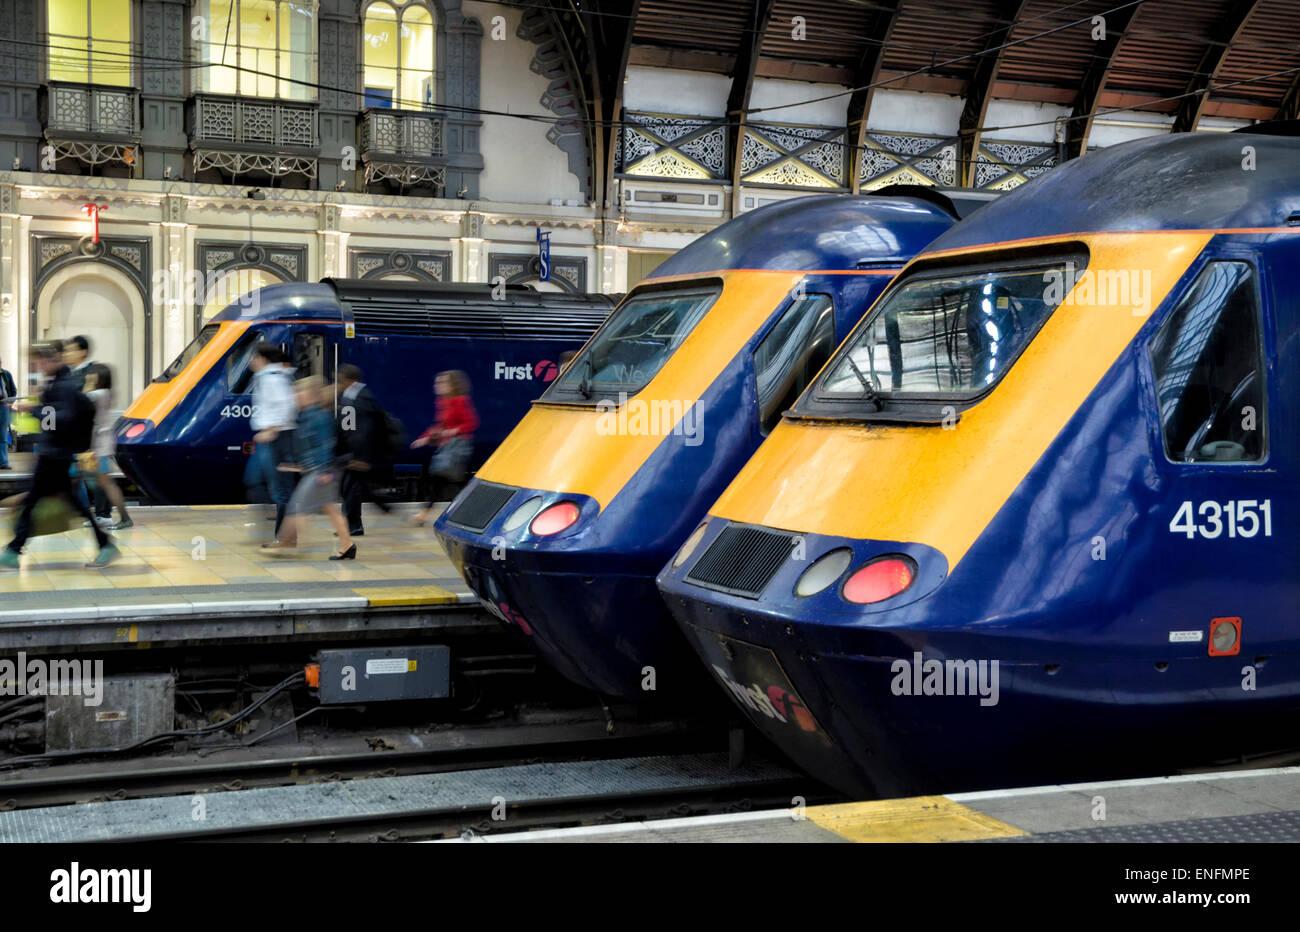 British high speed trains lined up at Paddington Station, London, UK. HST High speed rail transport - Stock Image